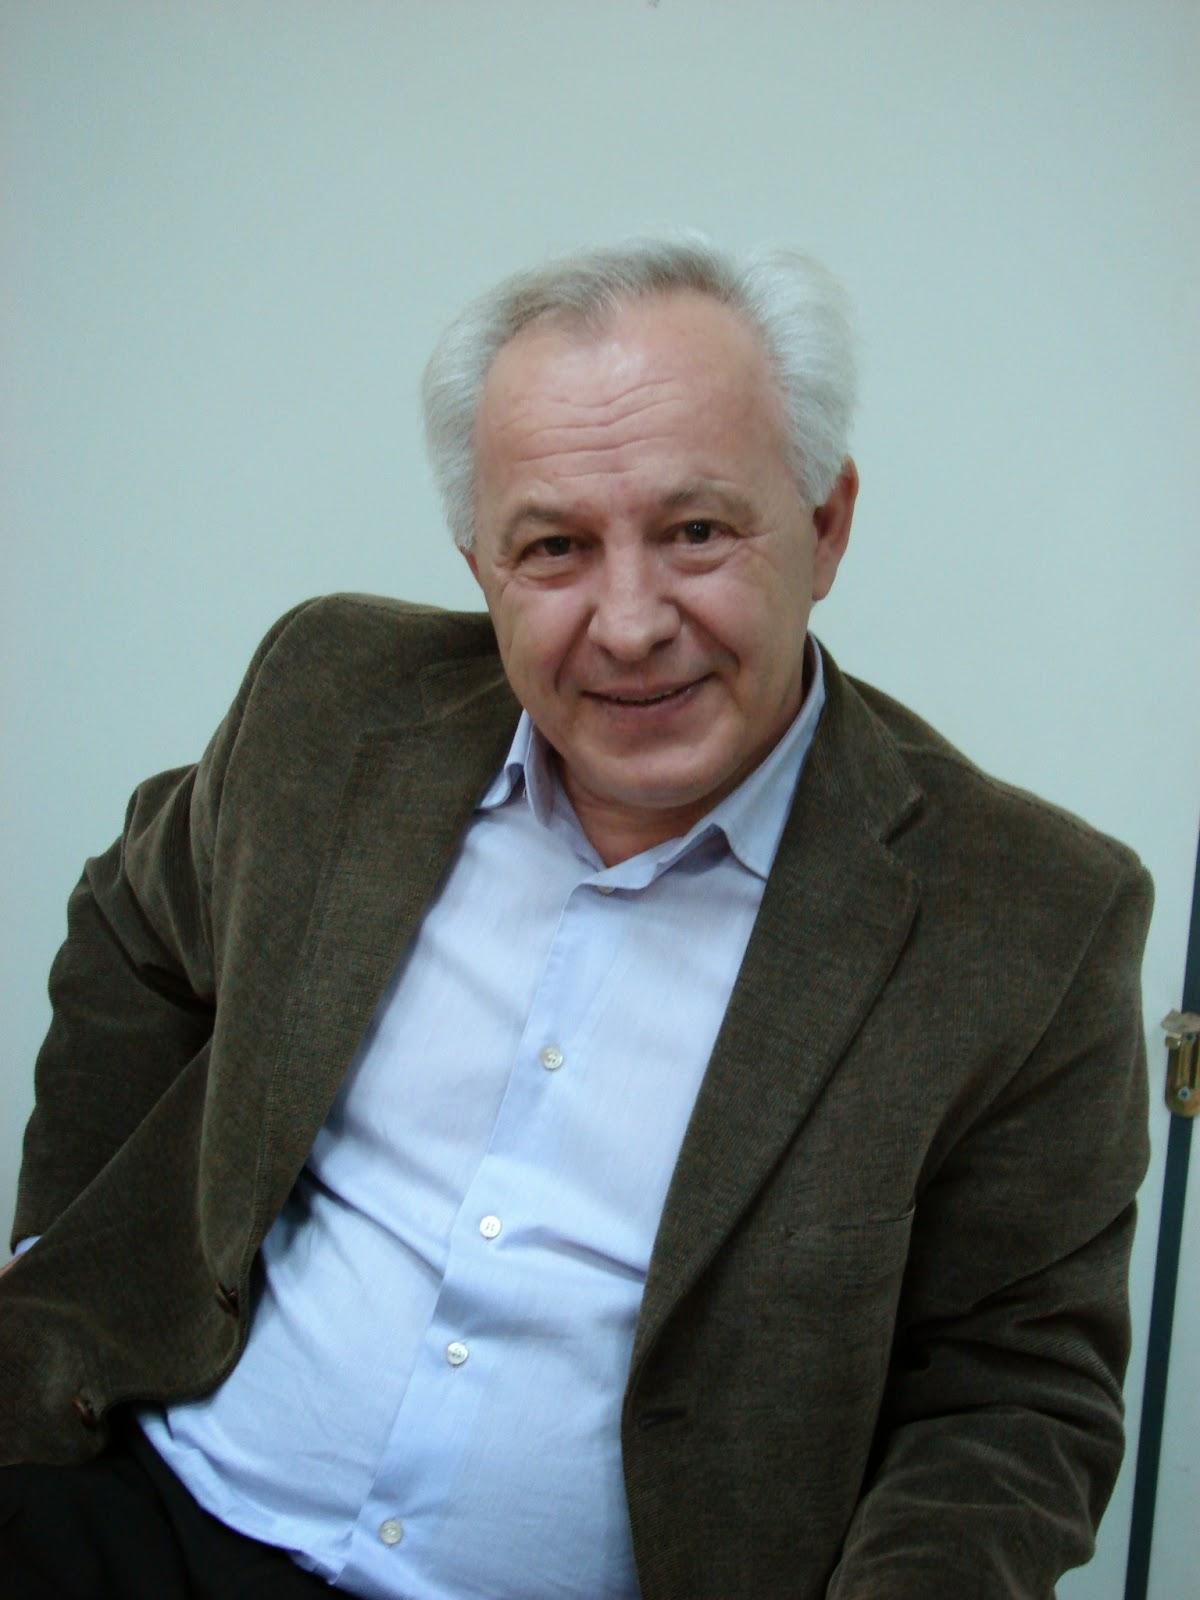 ORCHOMENOS-PRESS: Μπακομήτρος και Περγαντάς συνόδευσαν τον ...